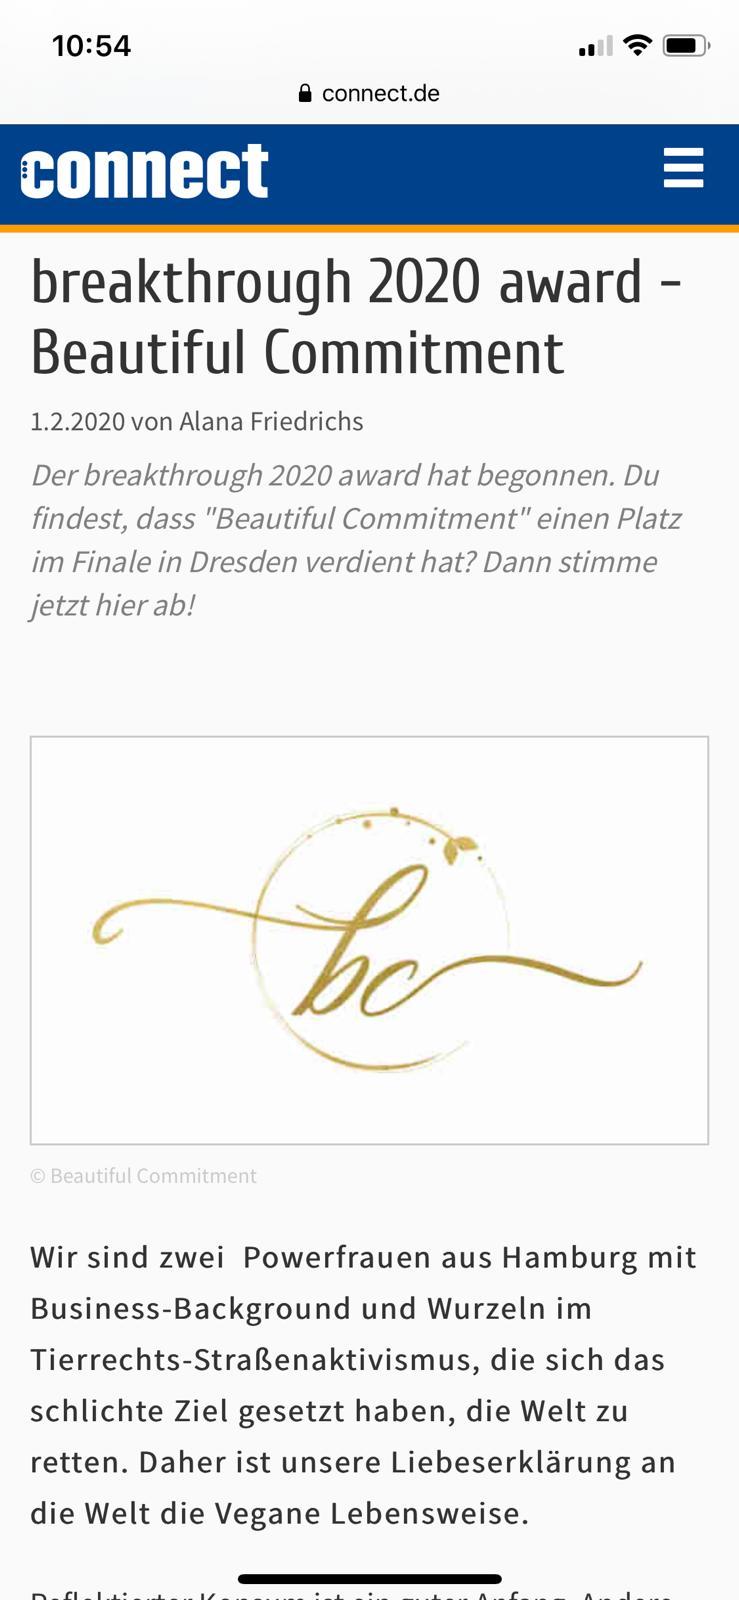 Beautiful Commitment Breakthrough Award 2020